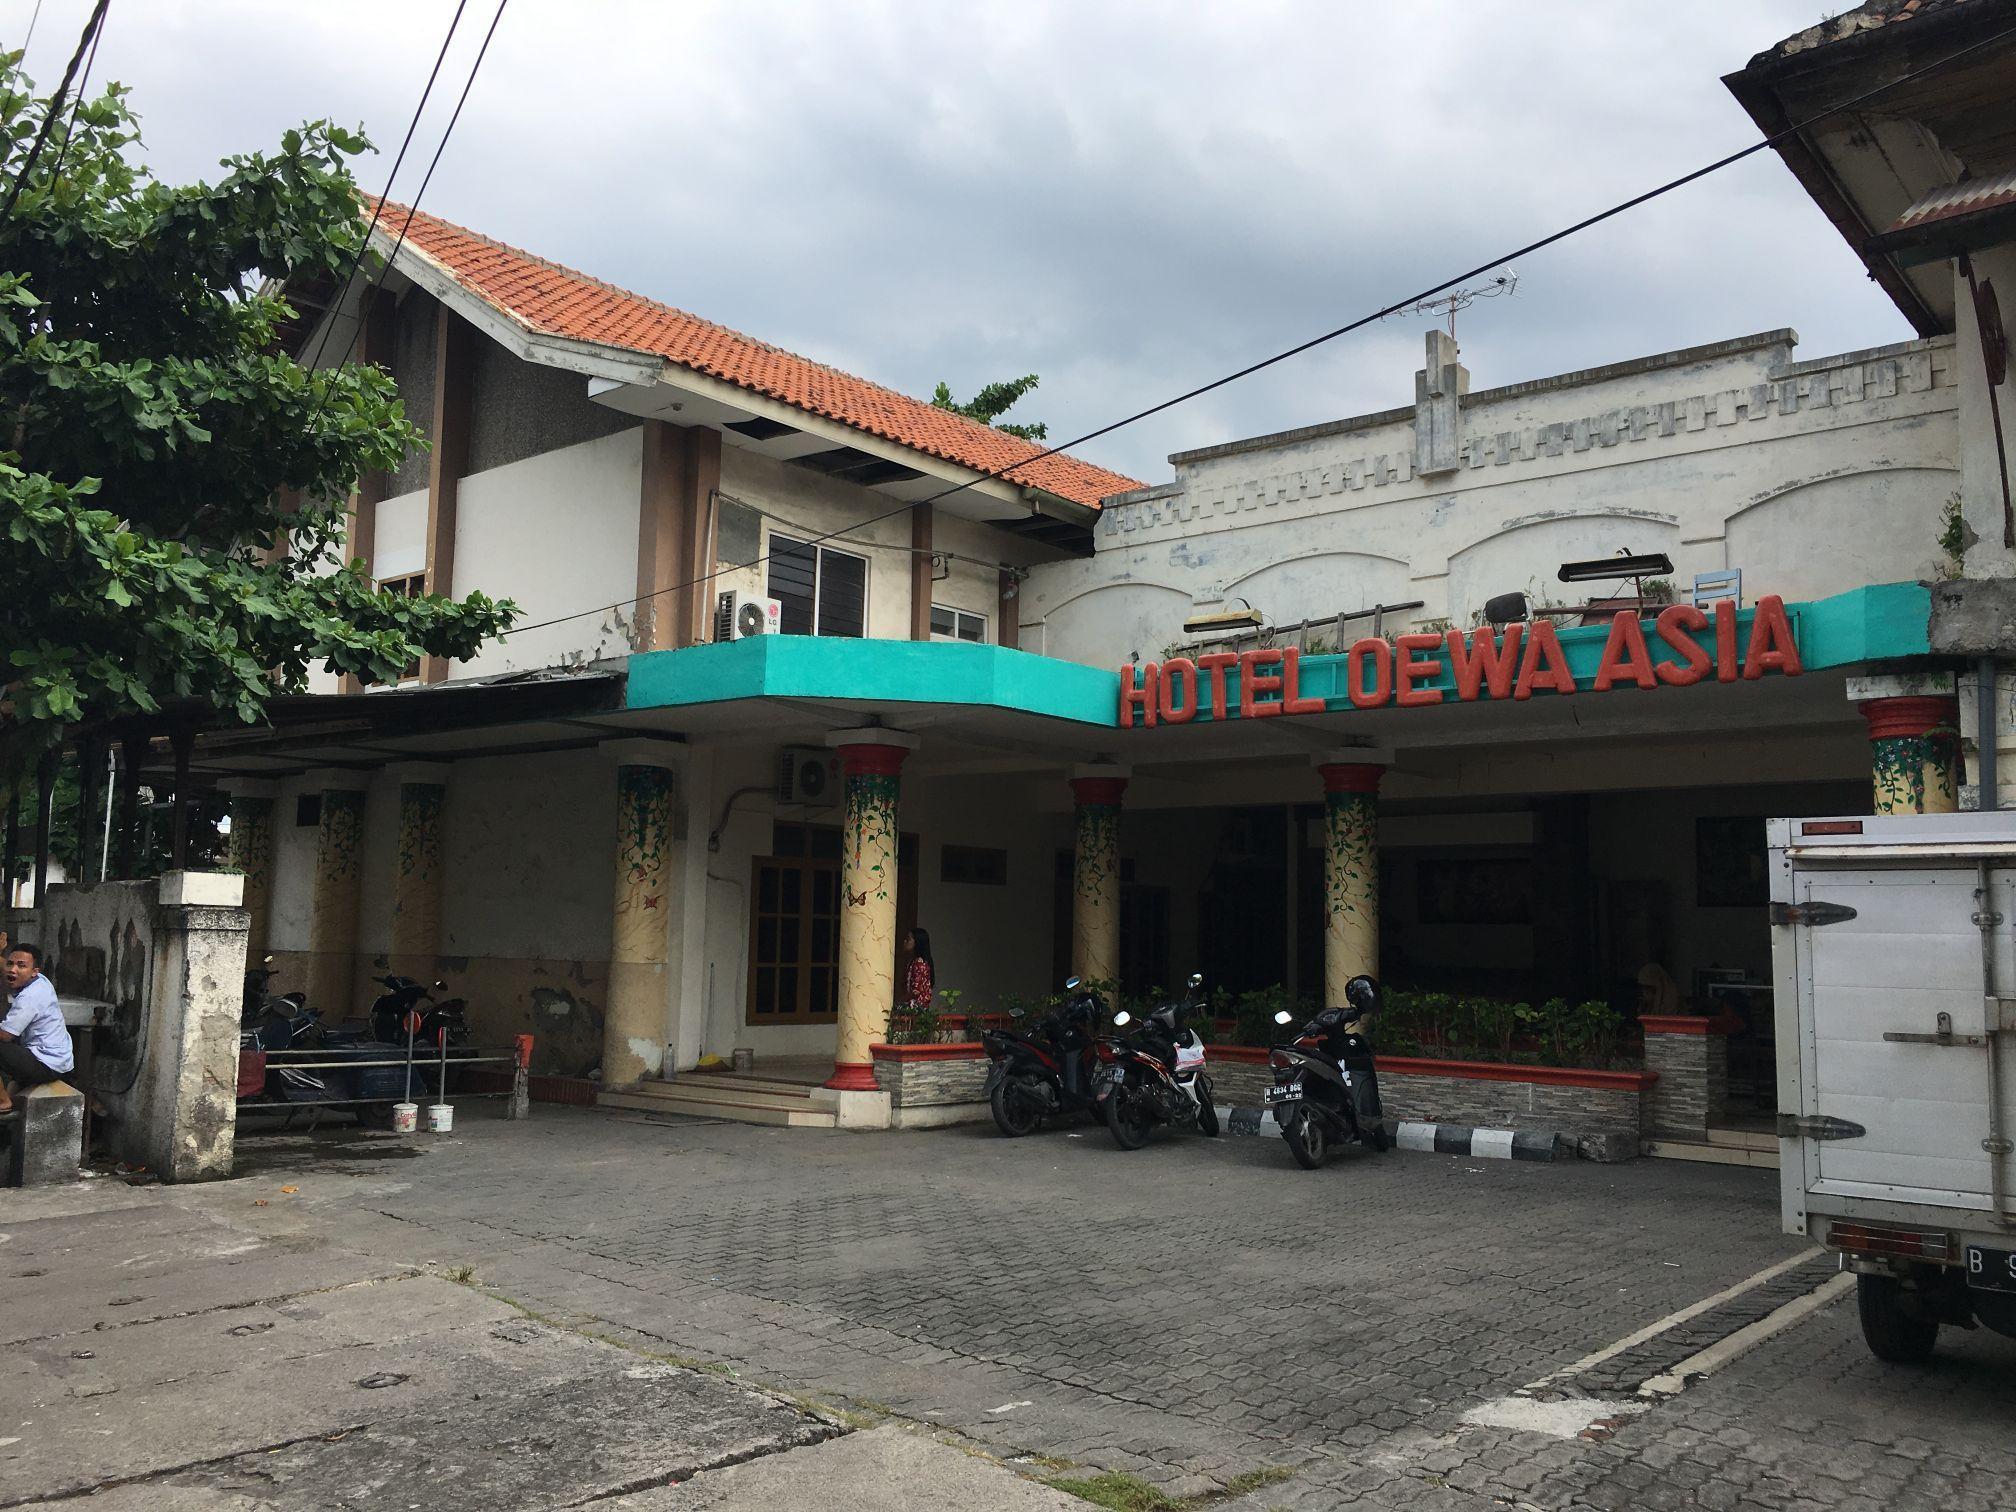 Oewa Asia Hotel, Semarang